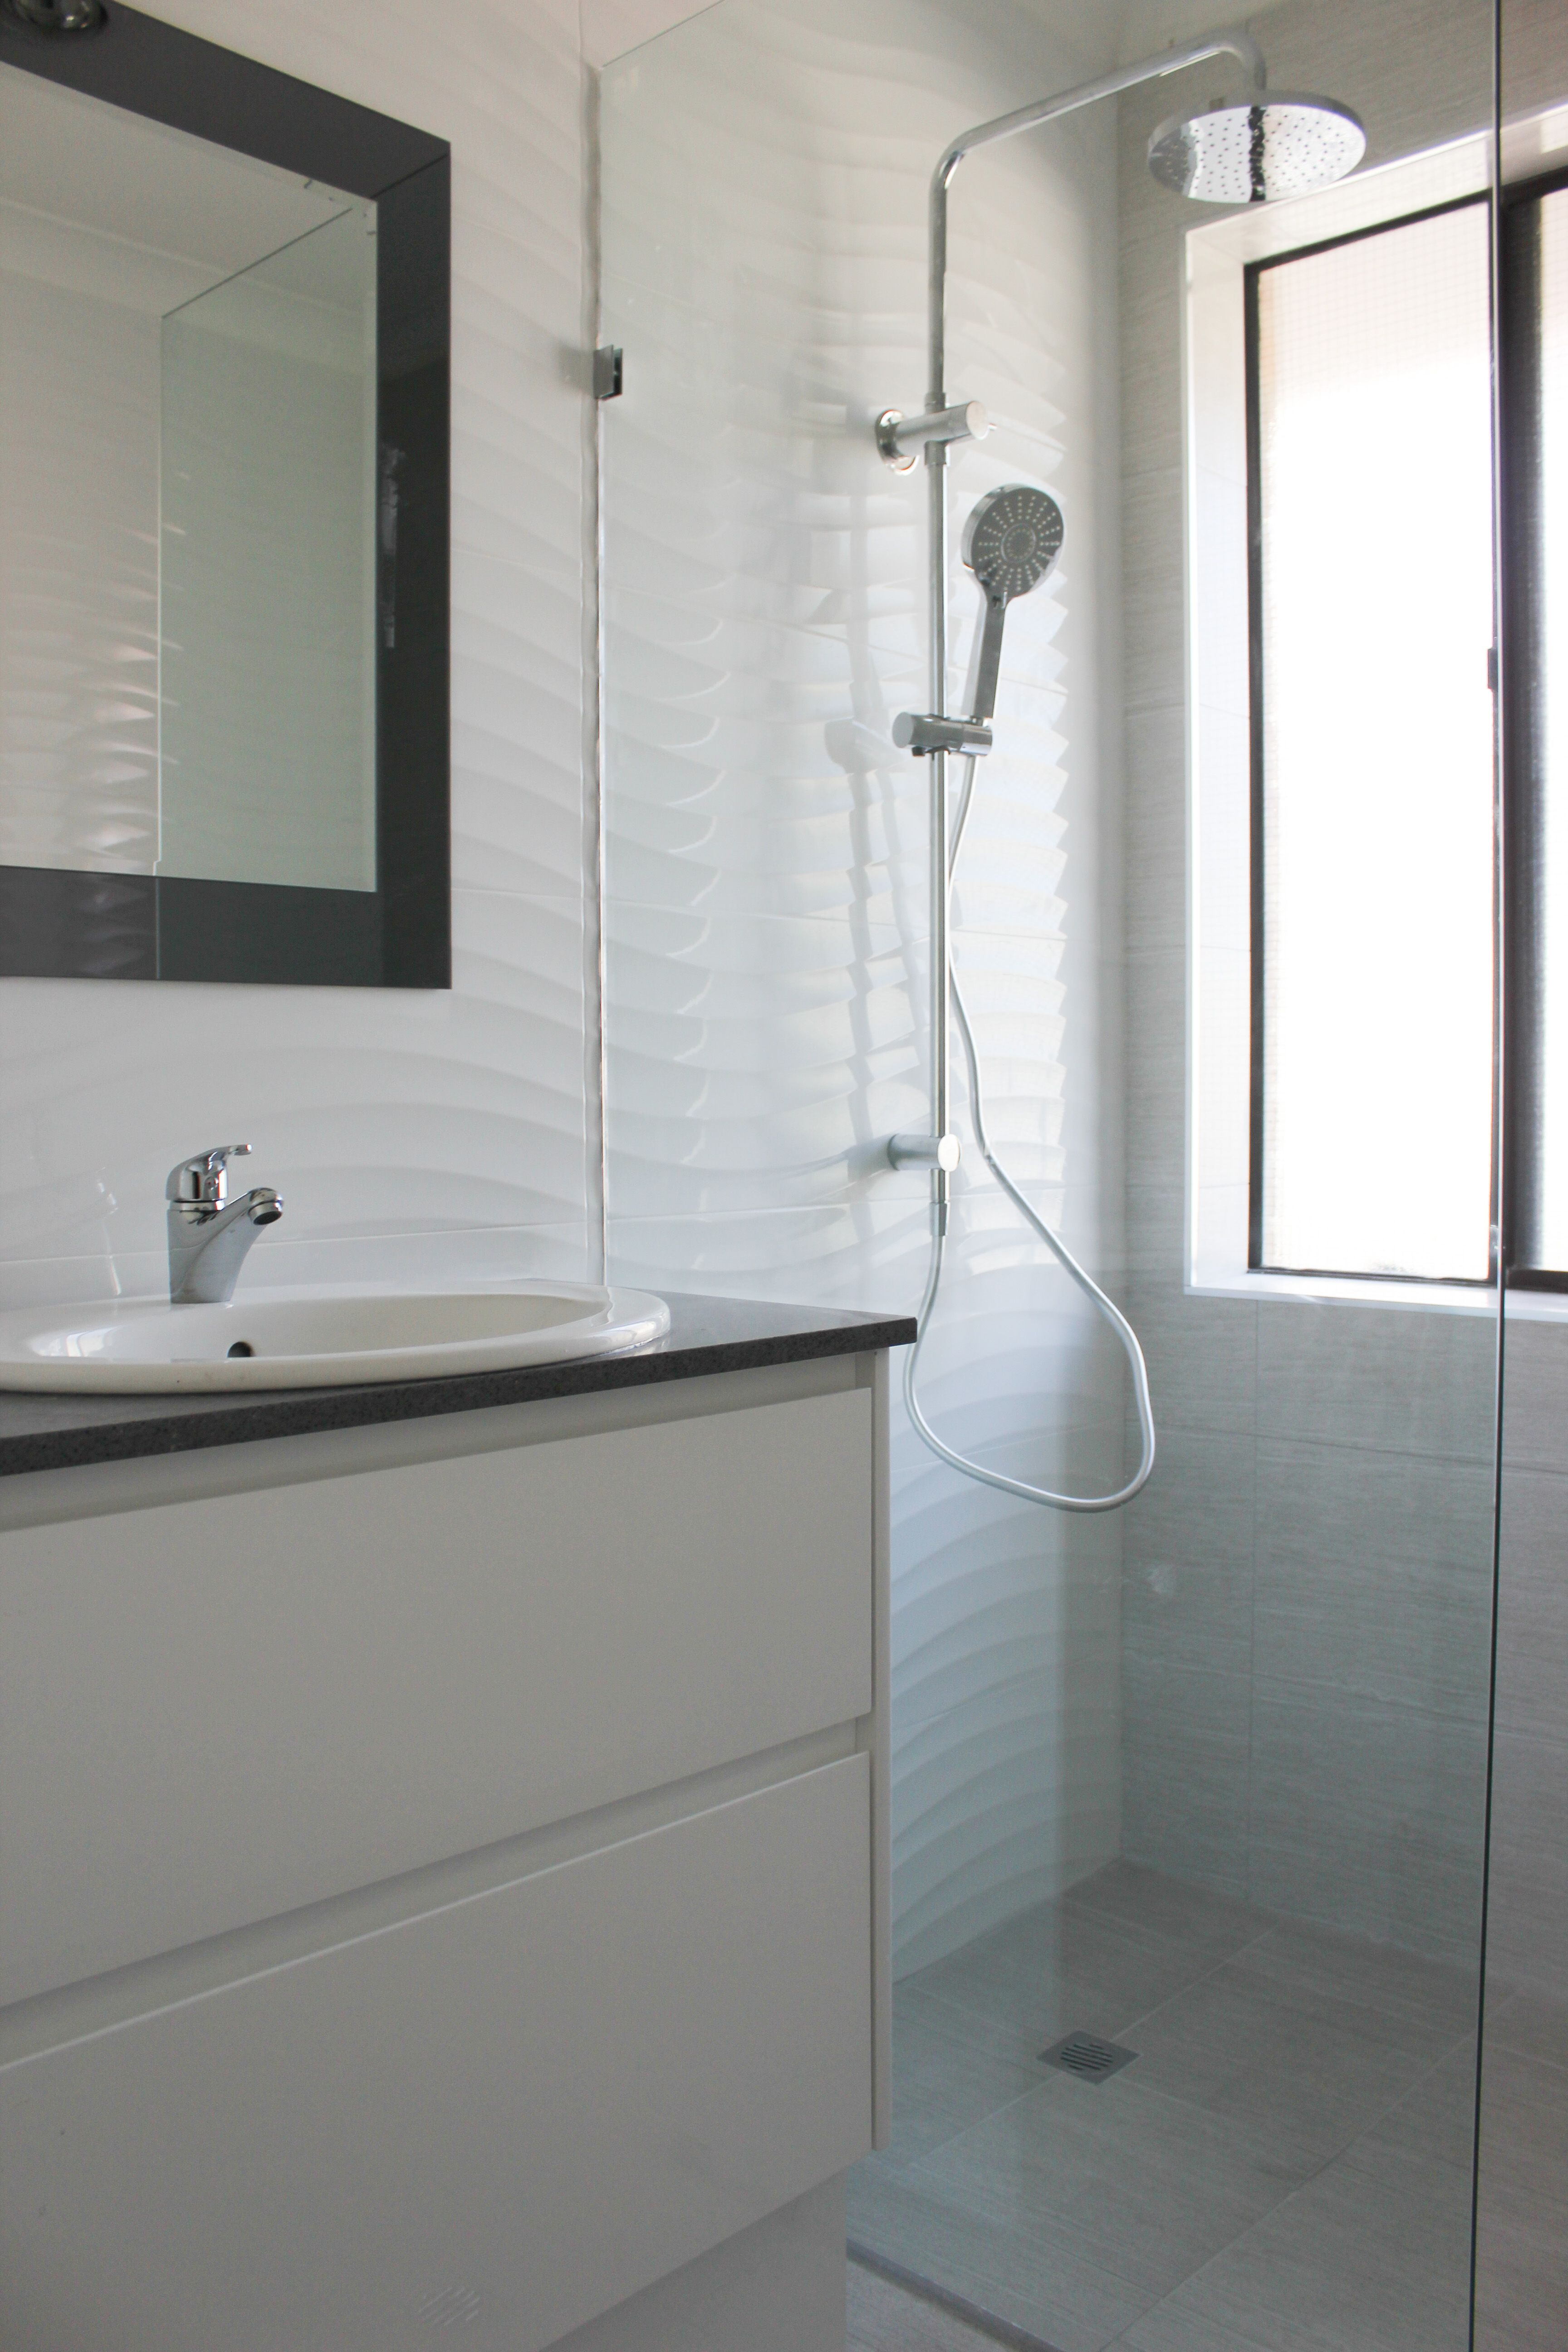 Grey Floor White Wall Grey And White Bathroom Black Mirror Shower Combo Light Bathroom Walk In S Gray And White Bathroom Black Bathroom Grey Flooring